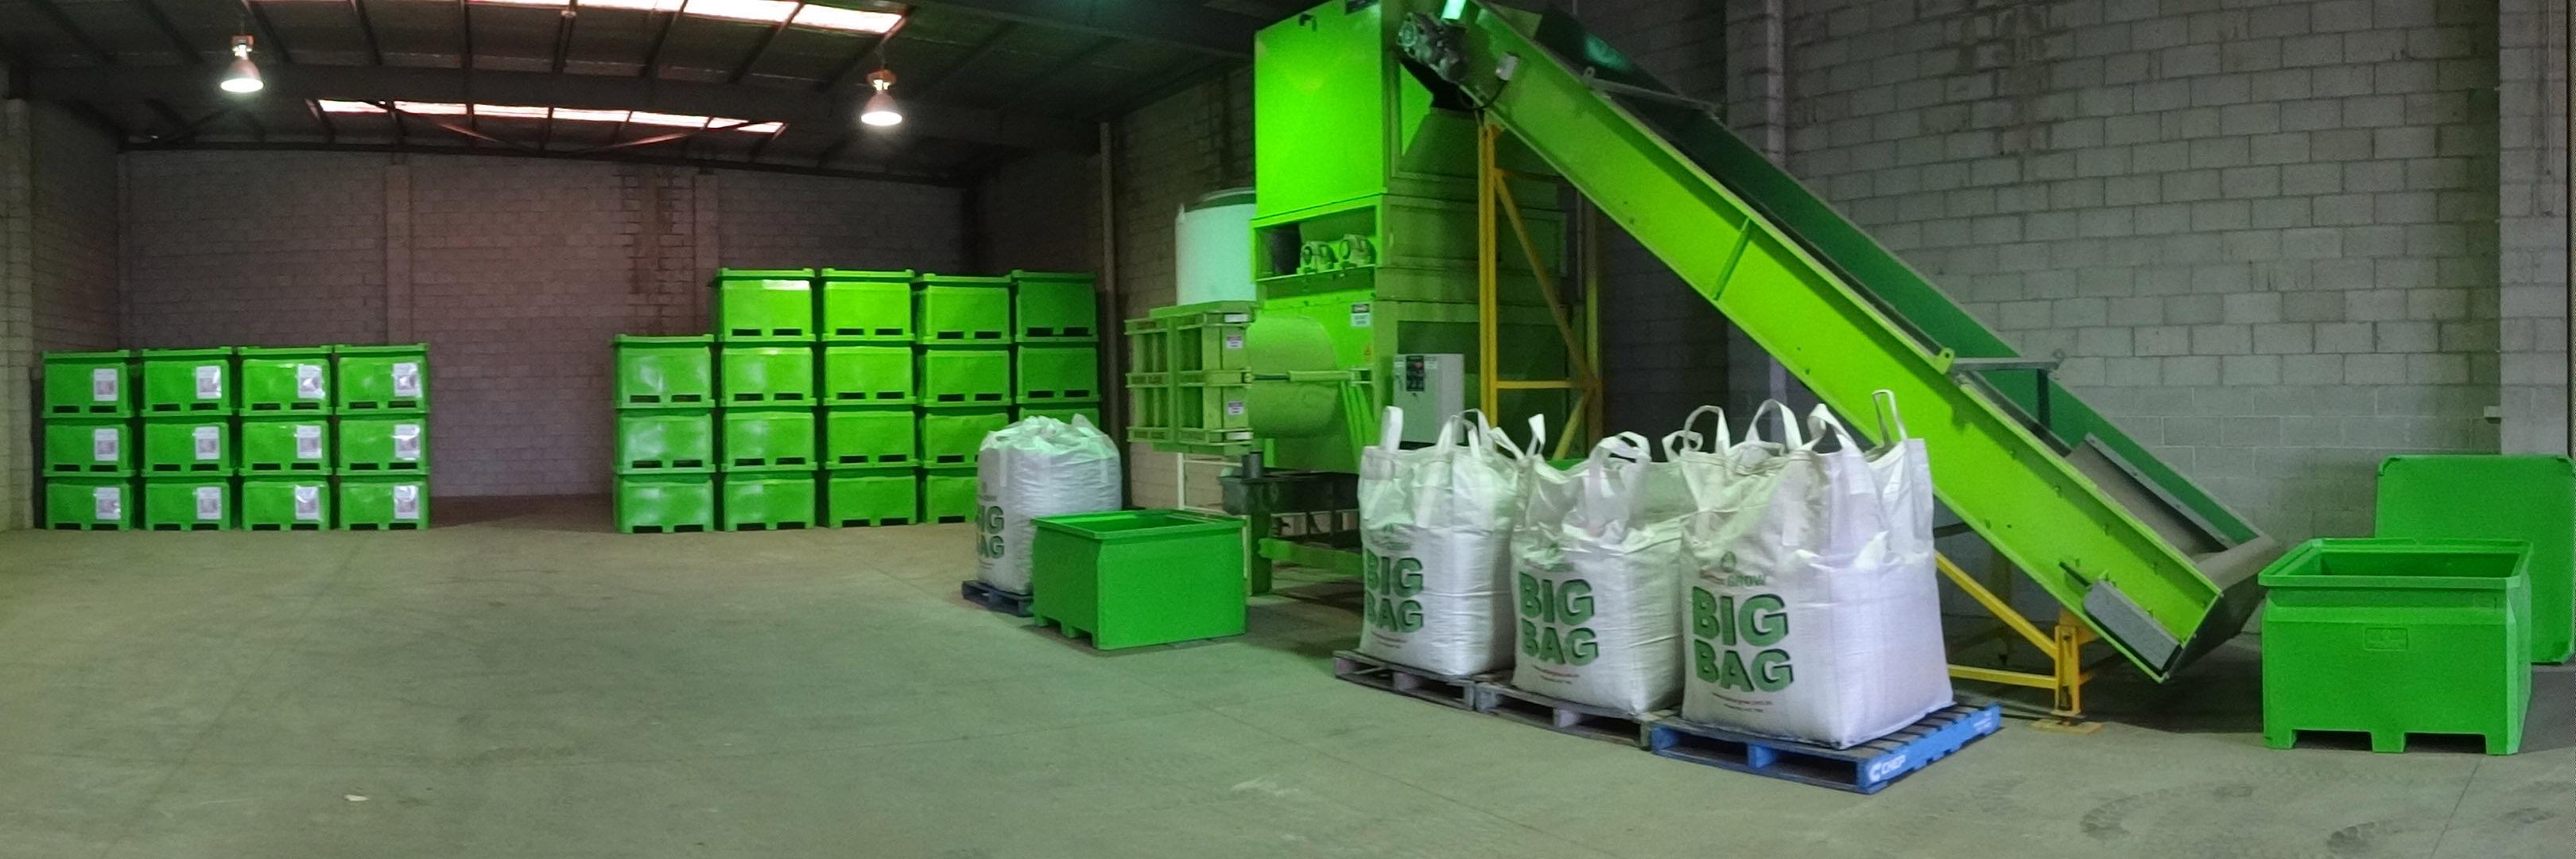 Bettergrow Bettergrow S Food Waste Facility